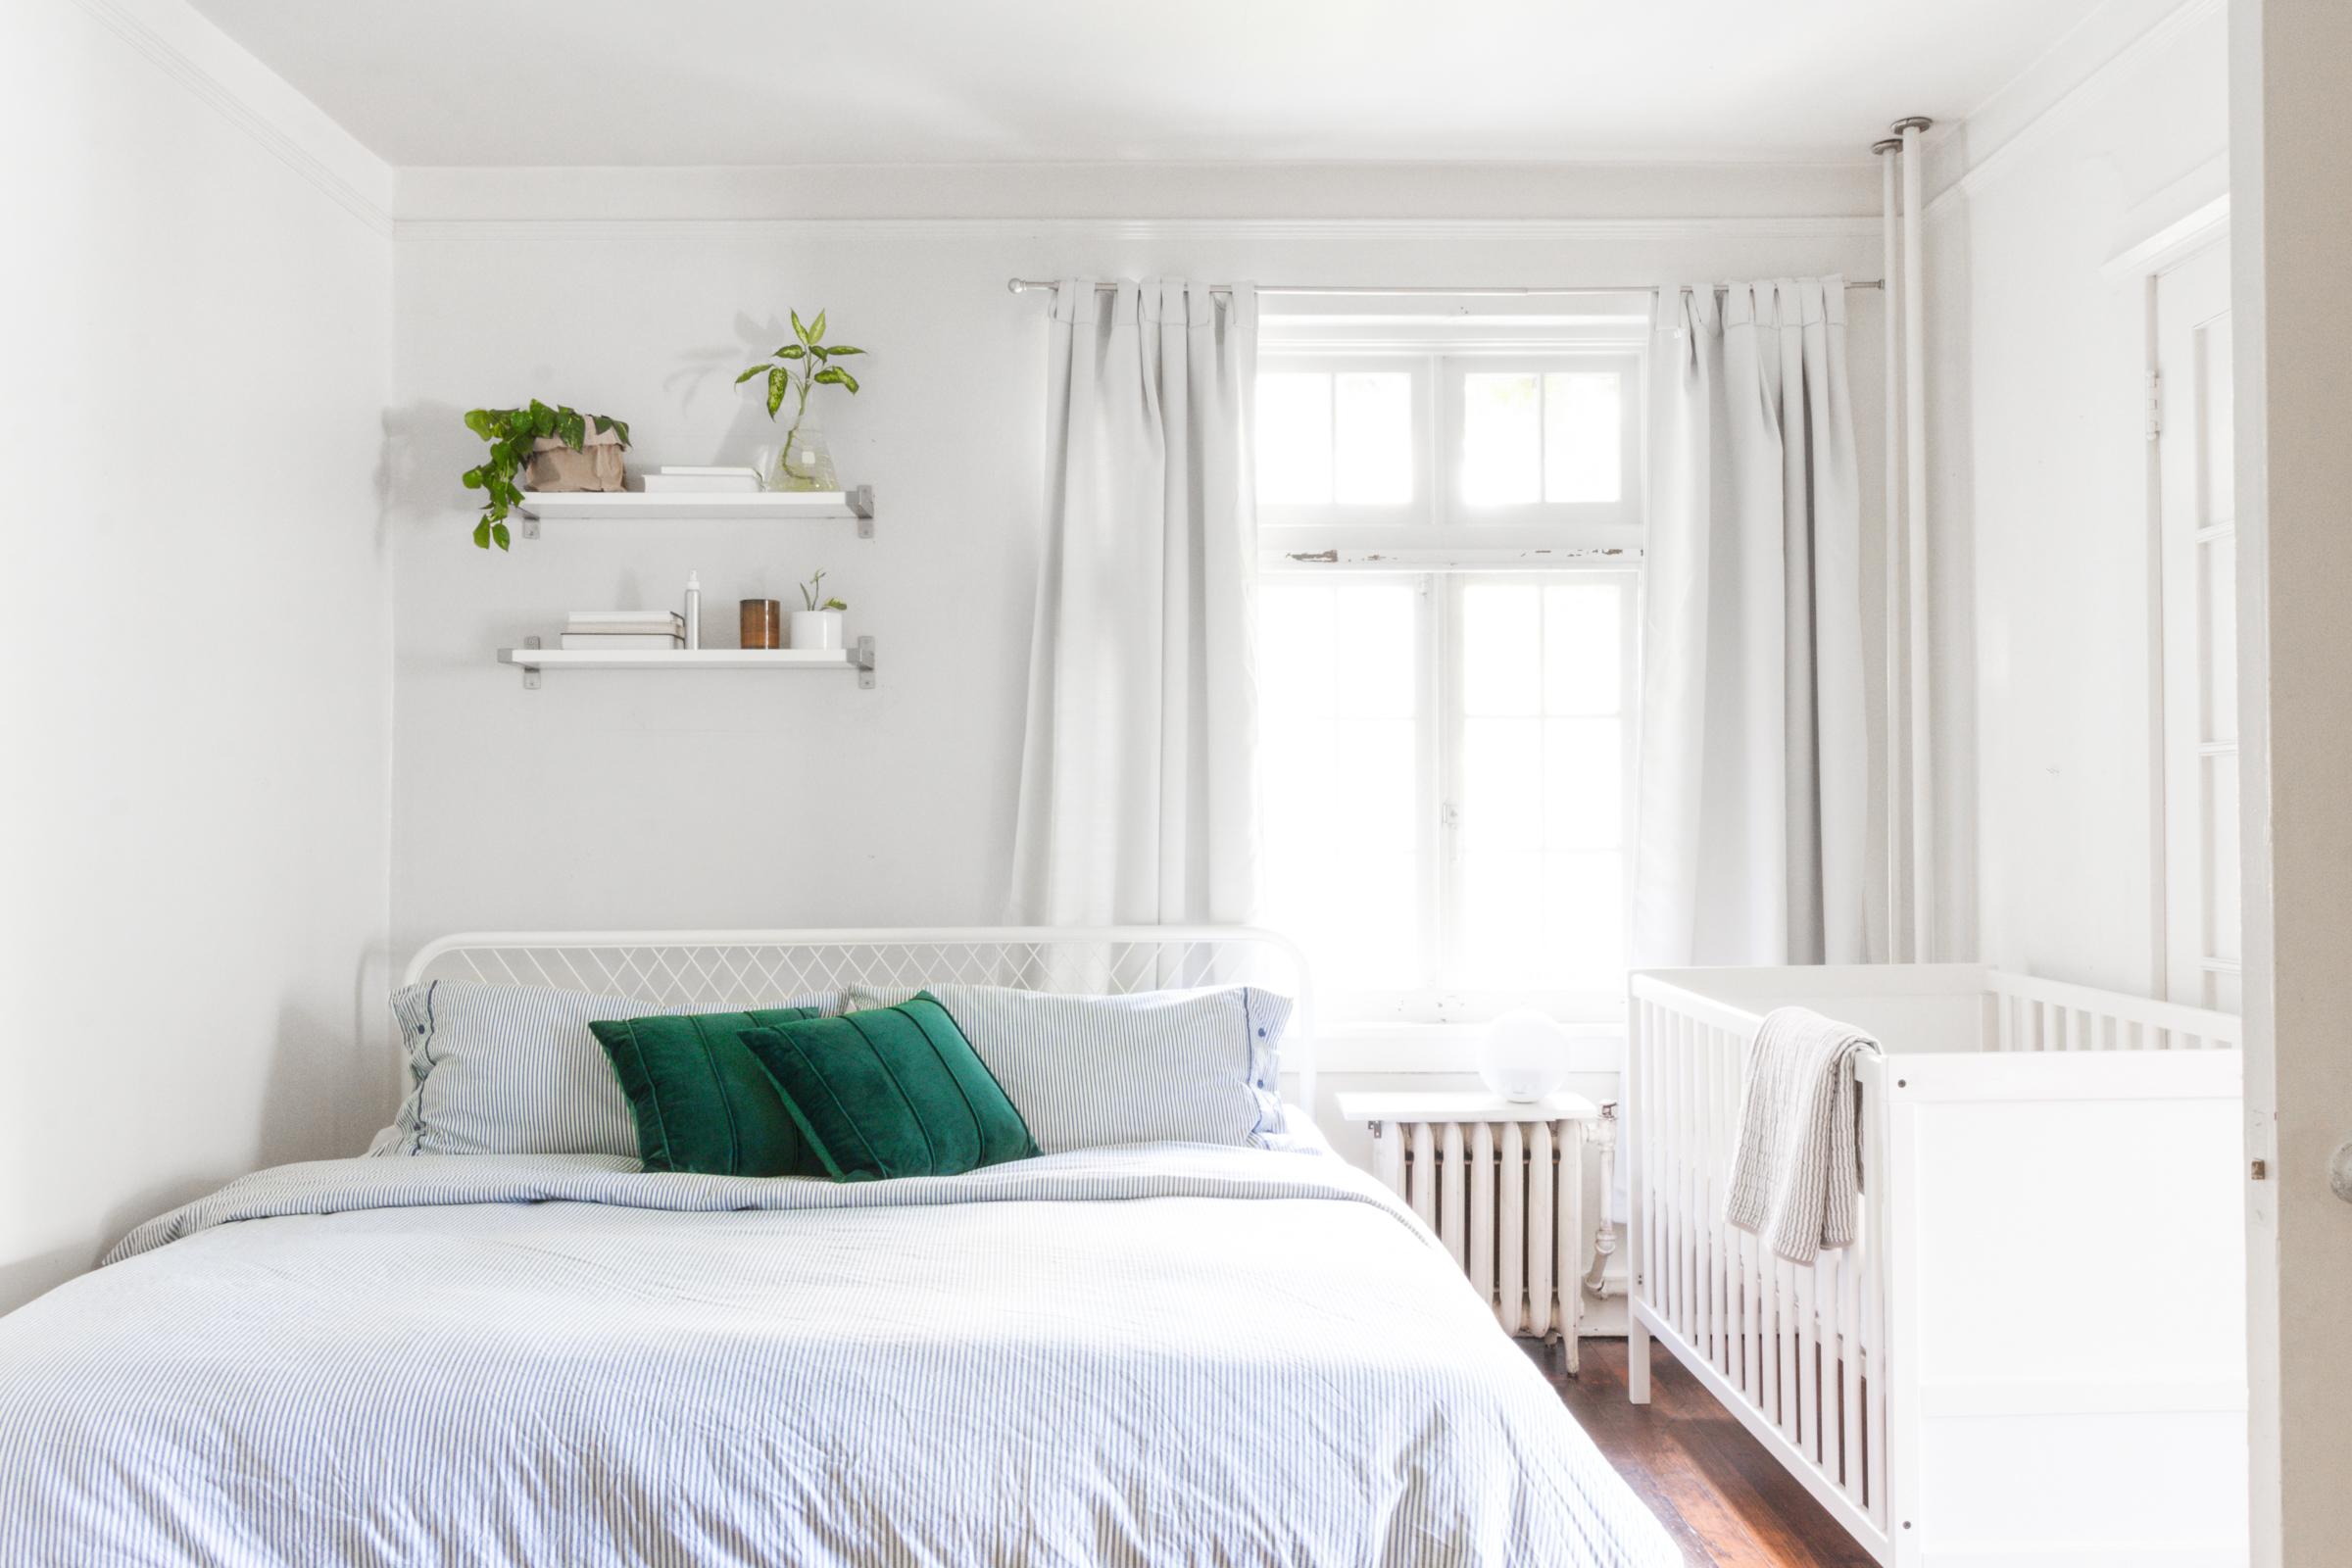 SHOP:  Curtains     Bed Frame